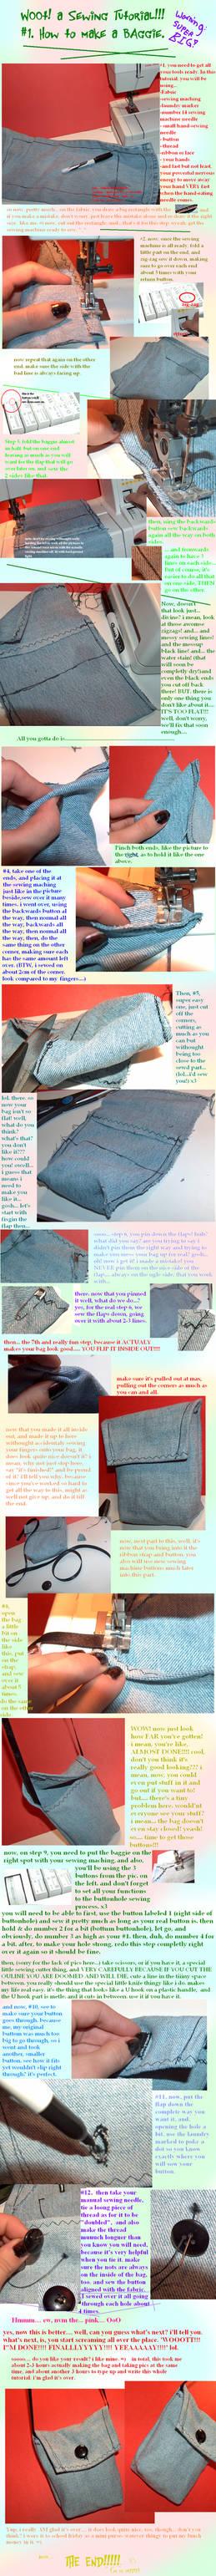 big sewing tutorial